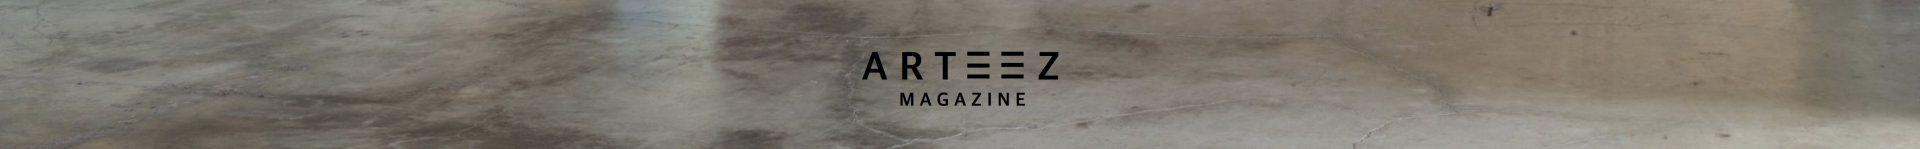 cropped-arteezmagazine_logo_marbre1.jpg